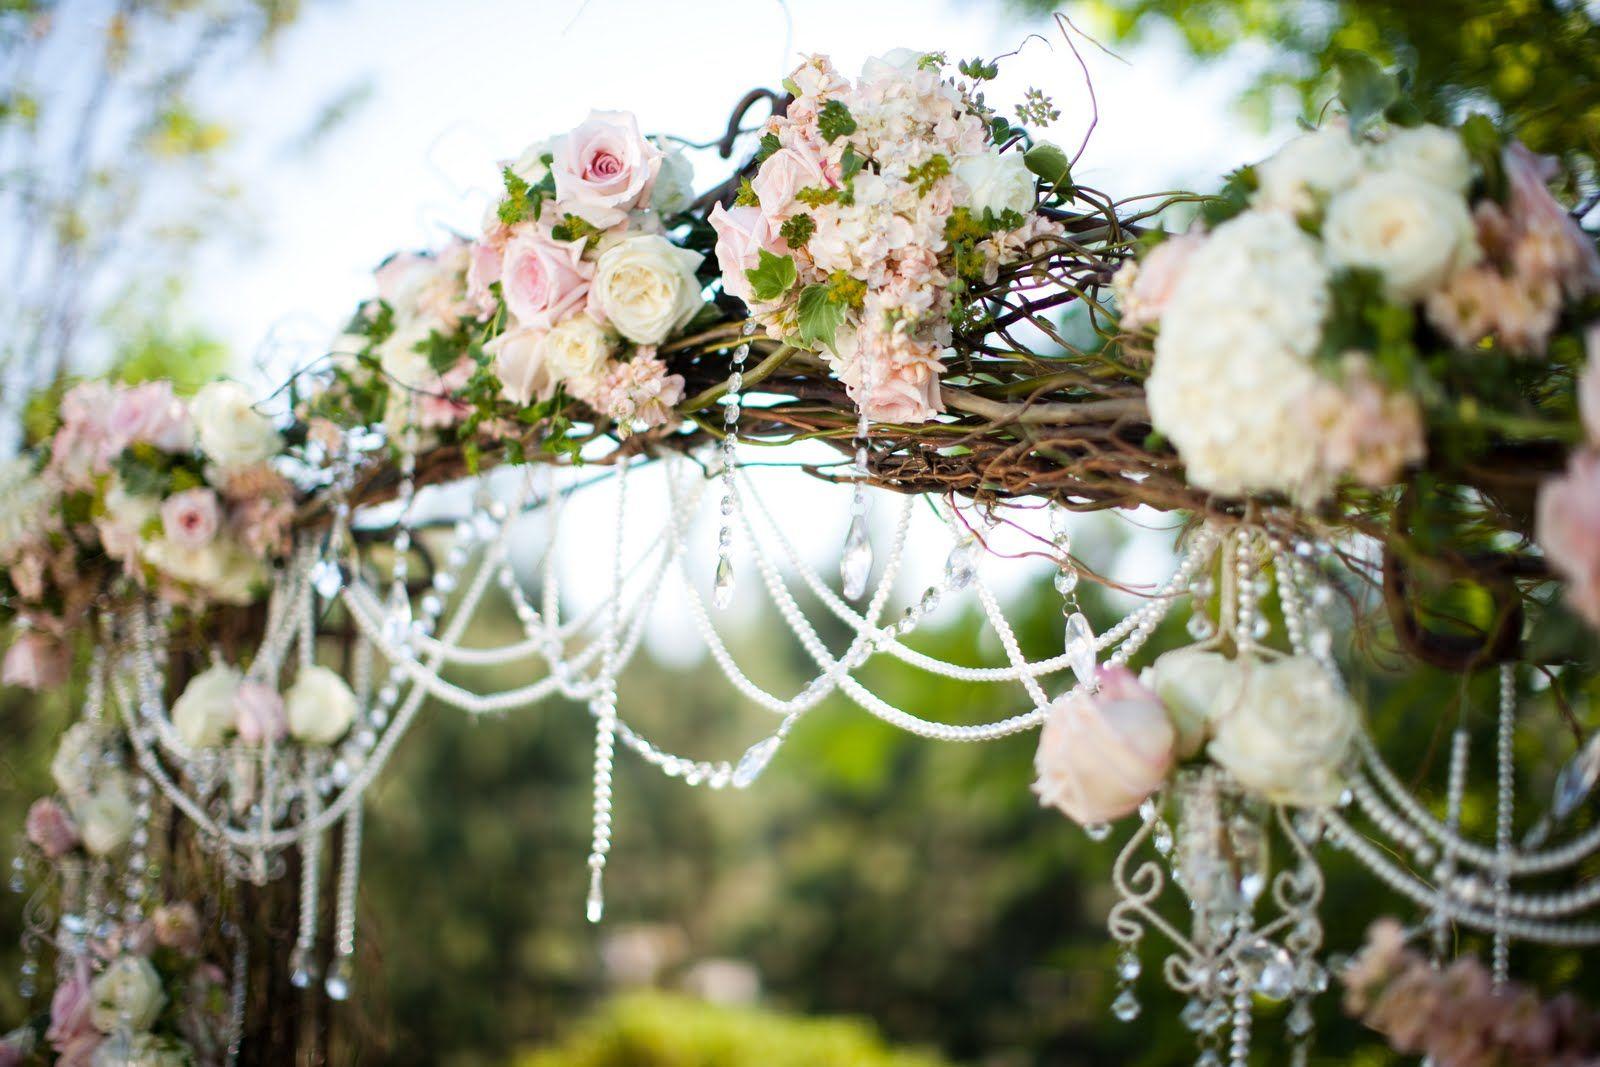 Rustic shabby chic wedding arbor ceremony decor pinterest best